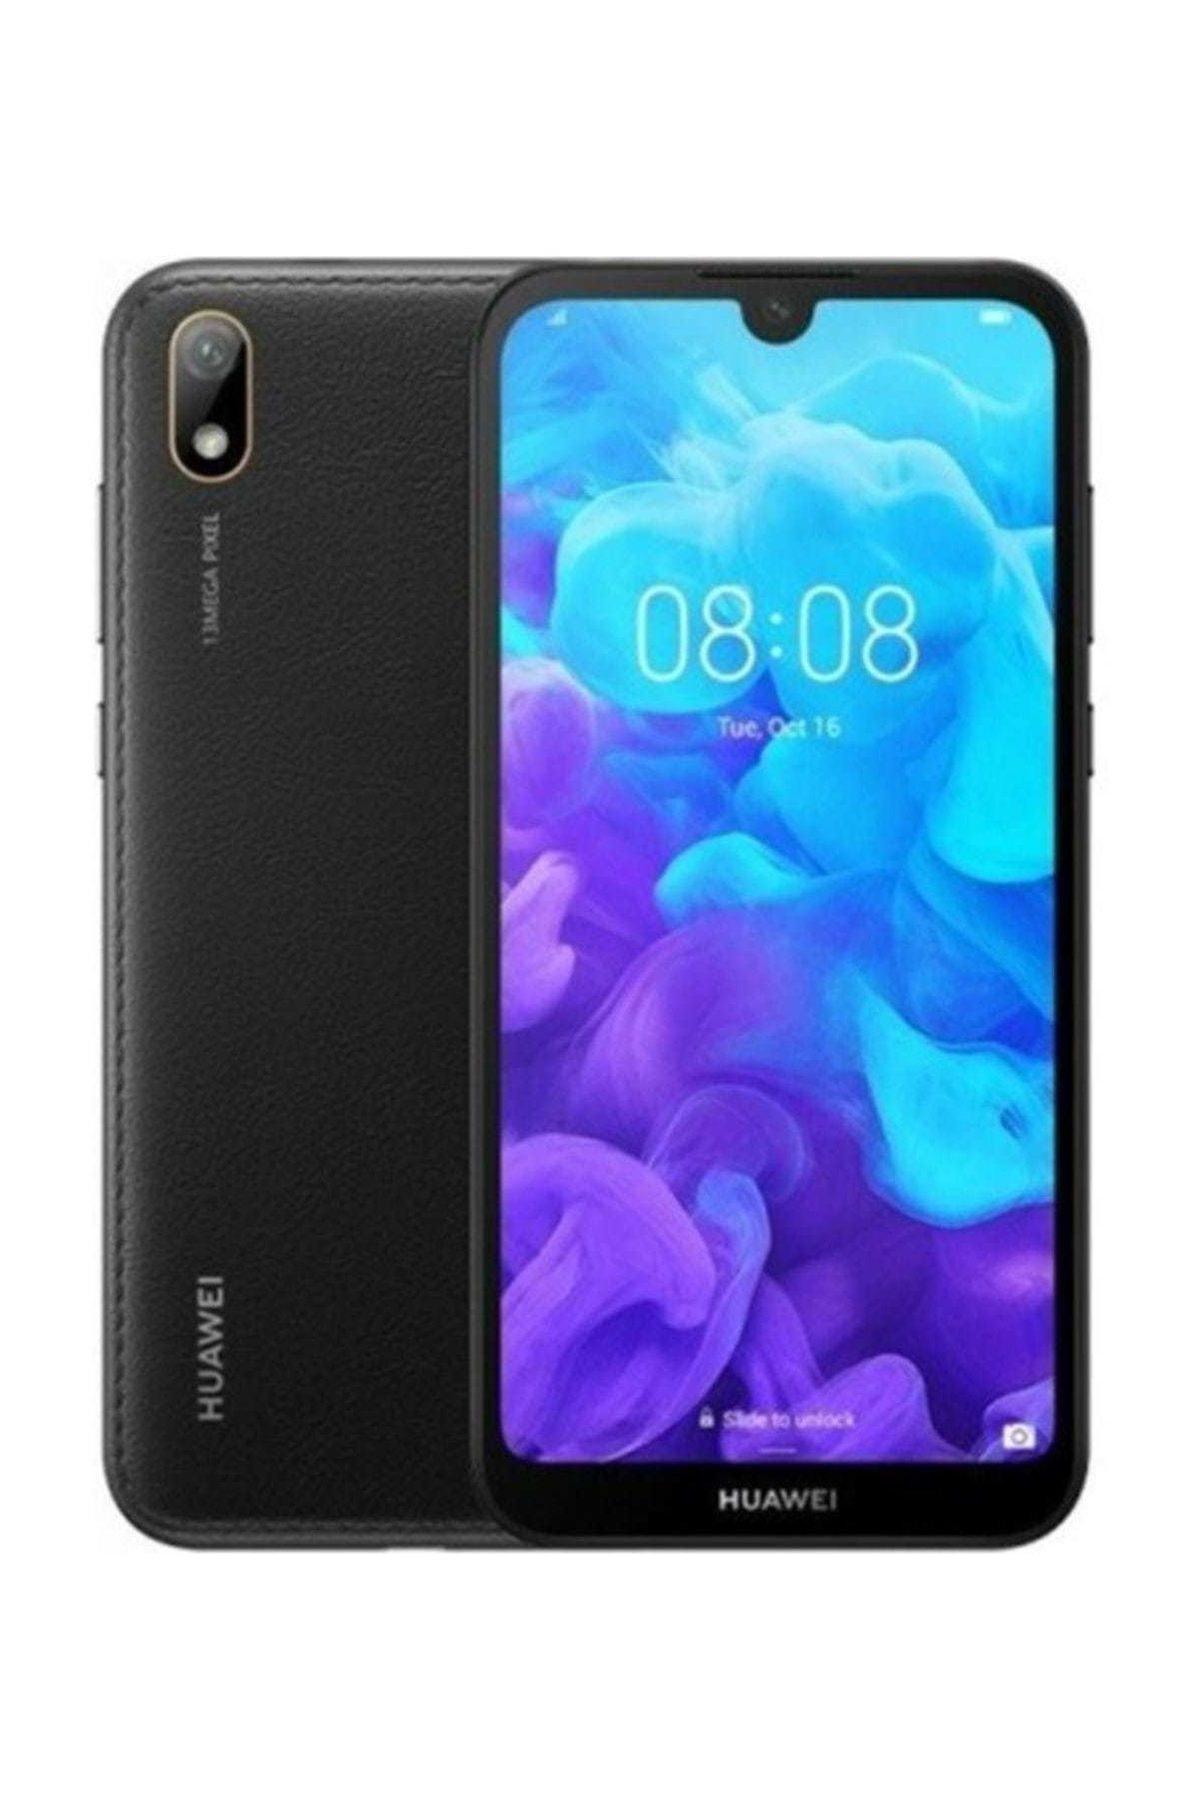 Huawei Y5 2019 16 GB Siyah Cep Telefonu (Huawei Türkiye Garantili) 2